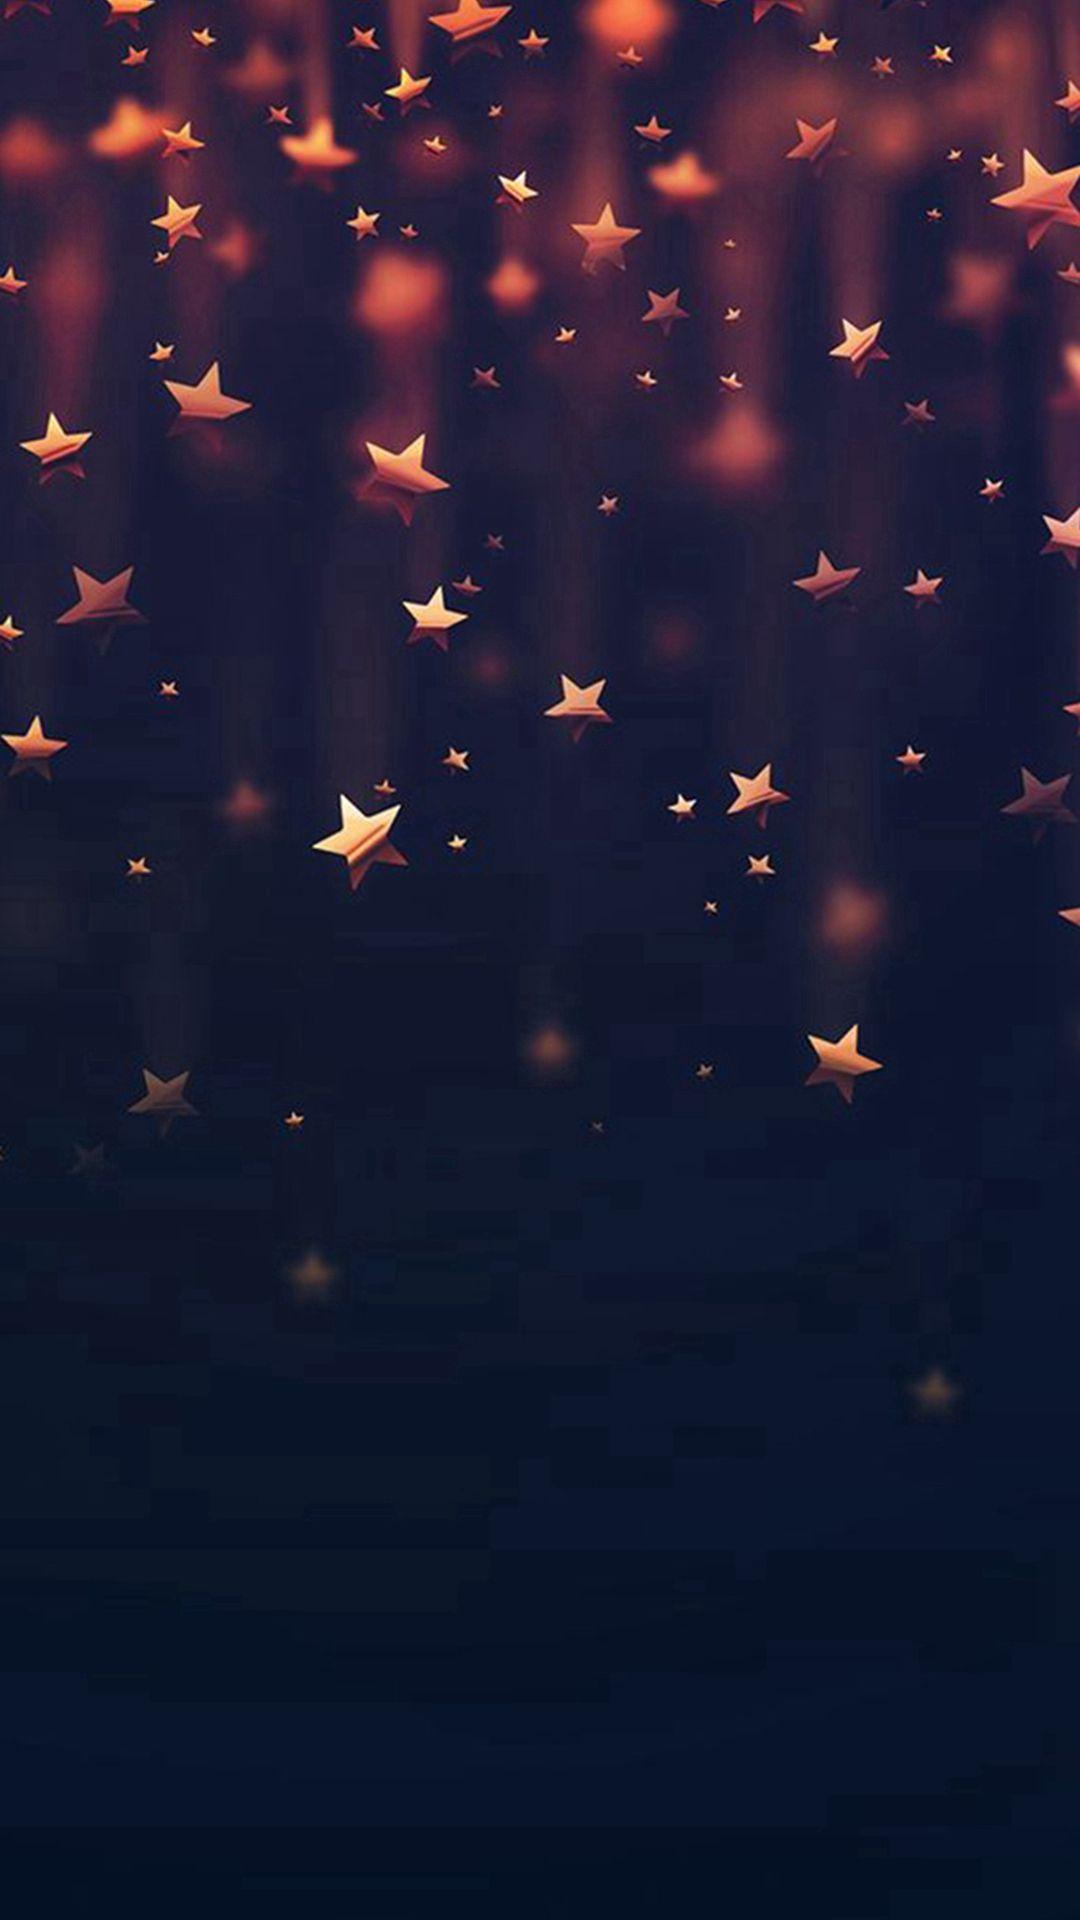 Ganz und zu Extrem Golden Falling Stars #iPhone #6 #wallpaper | iPhone 6~8 Wallpapers @SQ_37